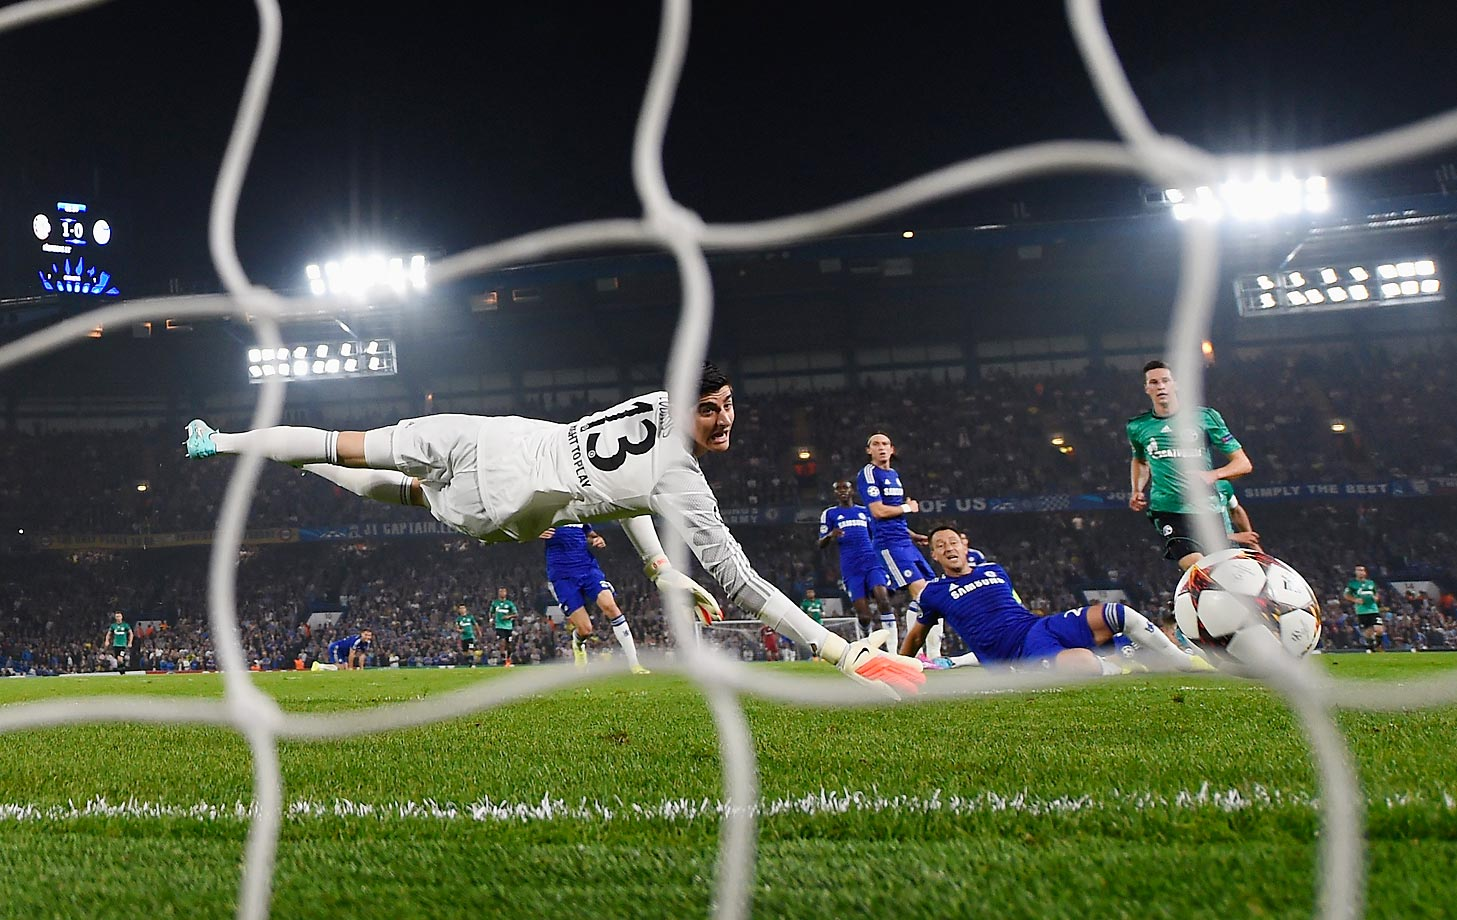 Thibaut Courtois of Chelsea dives in vain as Klaas-Jan Huntelaar of Schalke scores a goal during the UEFA Champions League Group G match.